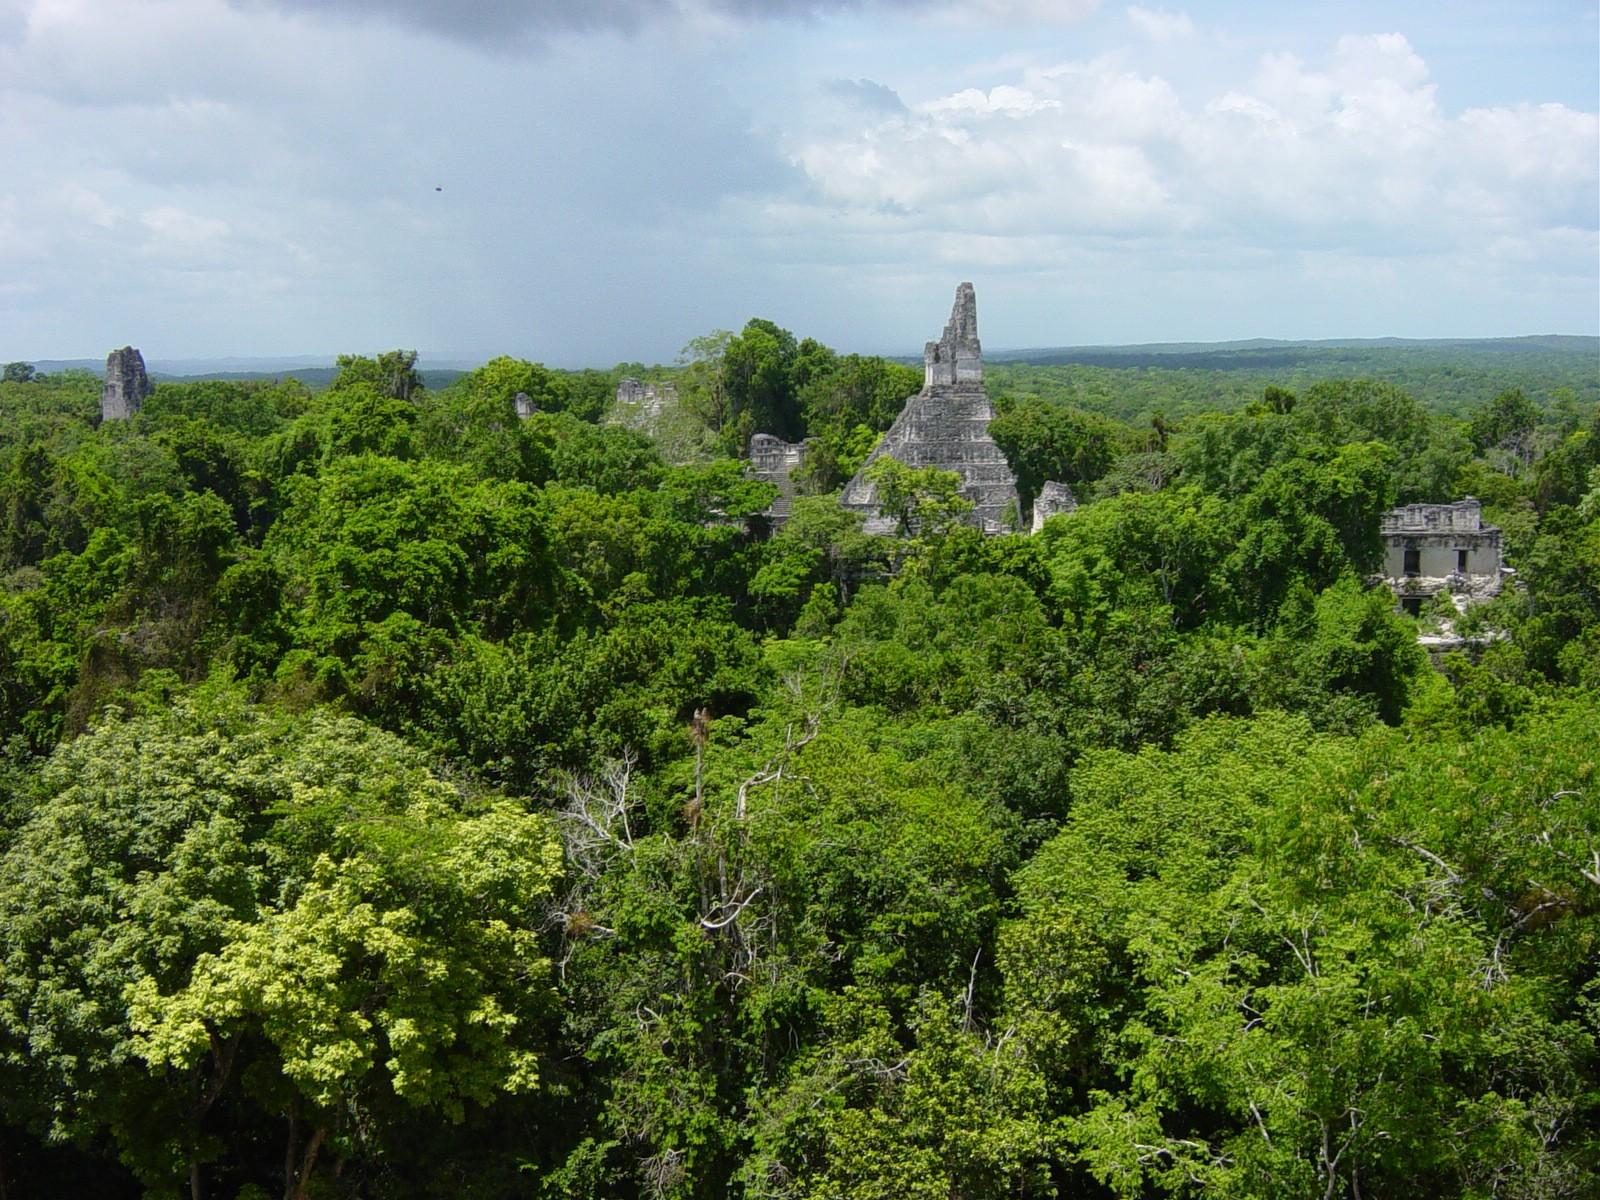 gua10-jungle-trek-to-a-lost-city-free